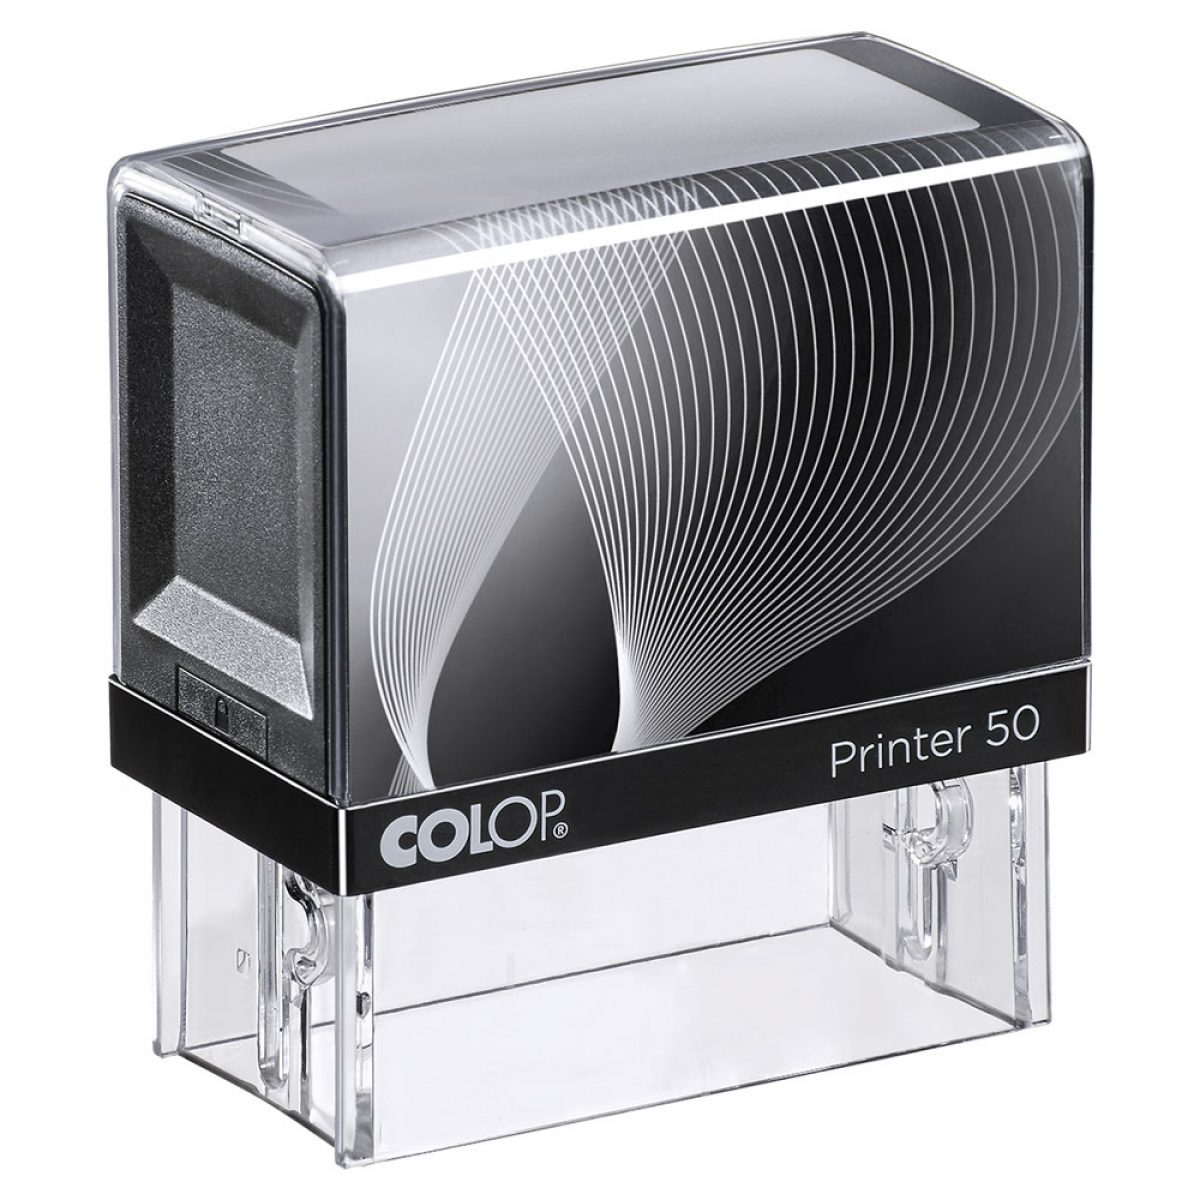 PRINTER 50 G7 - 30 x 59 mm